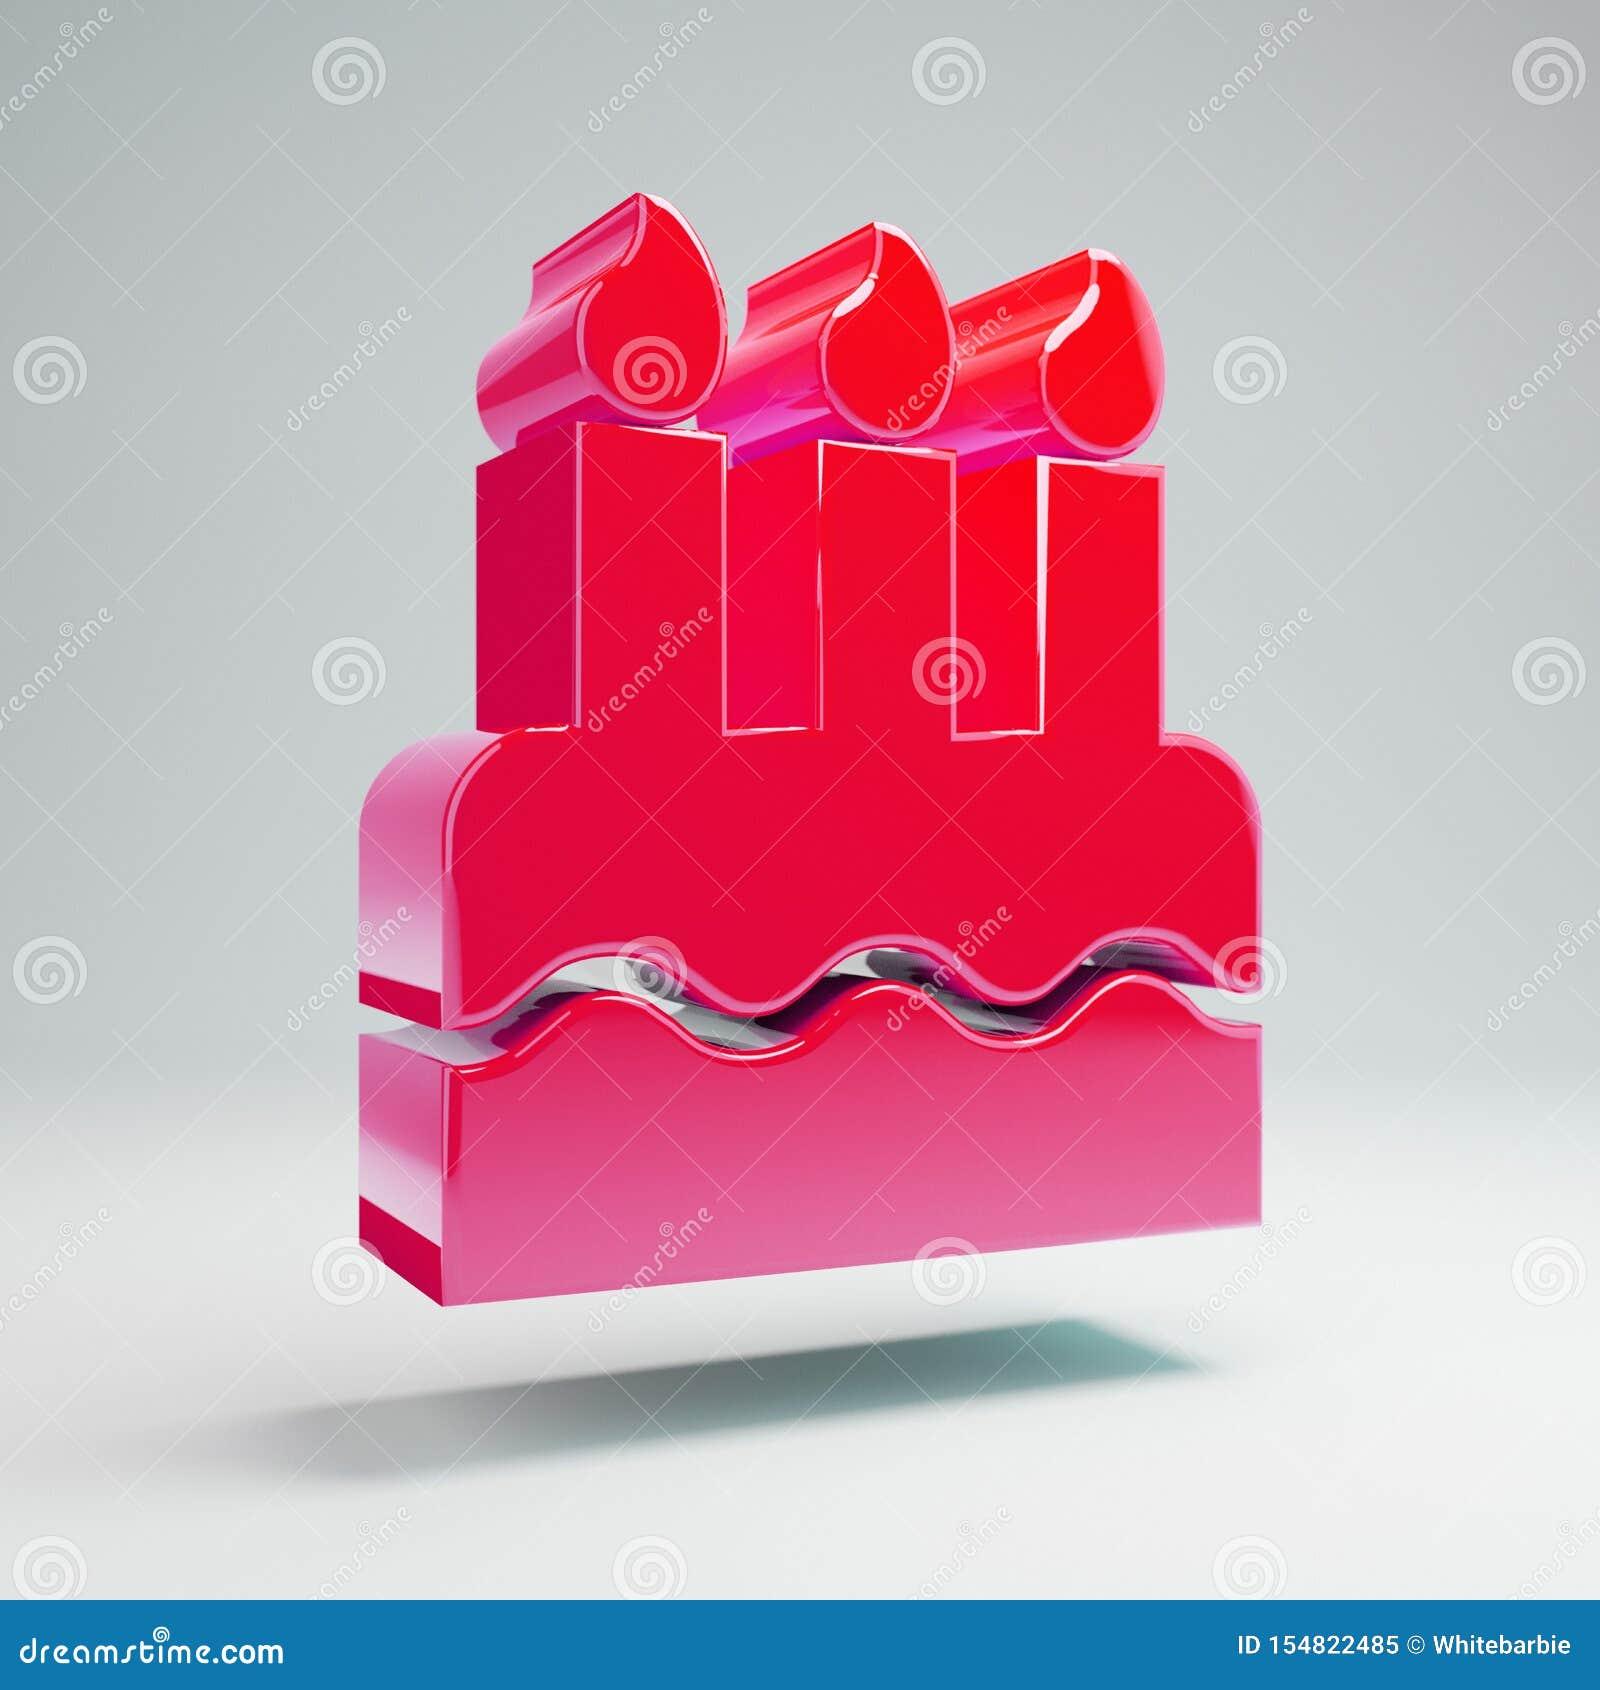 Brilliant Volumetric Glossy Hot Pink Birthday Cake Icon Isolated On White Birthday Cards Printable Inklcafe Filternl